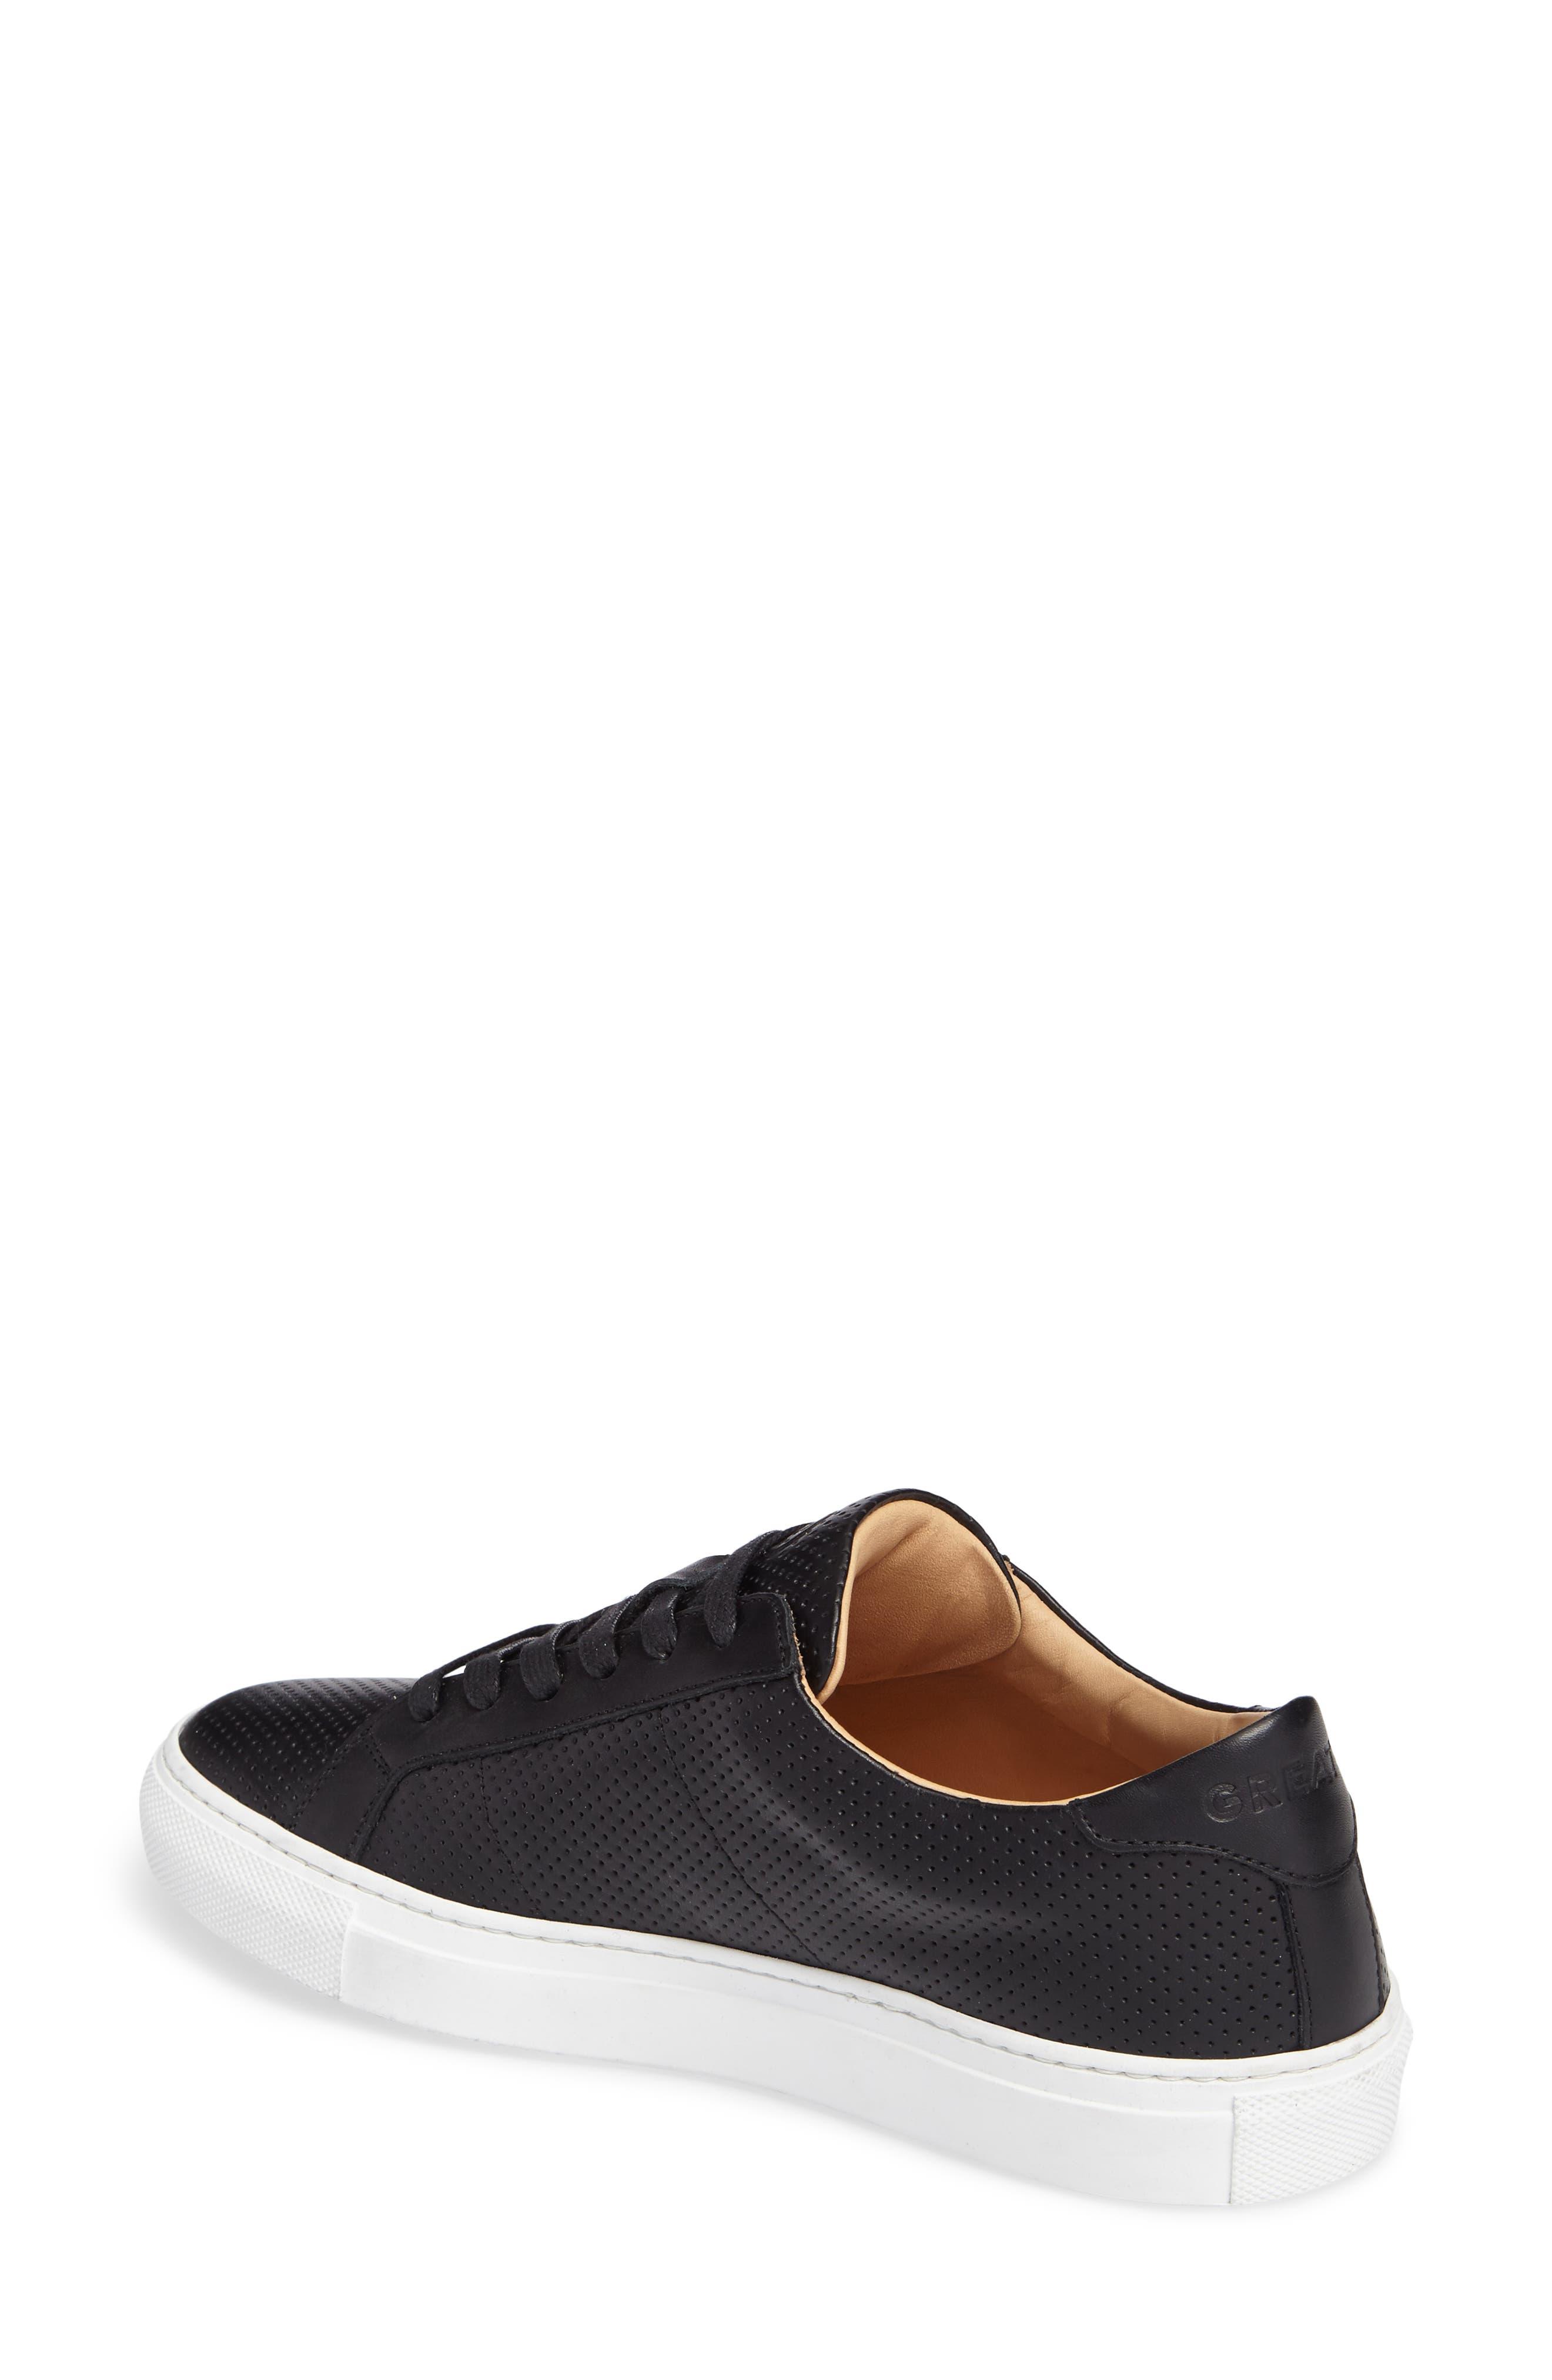 Royale Low Top Sneaker,                             Alternate thumbnail 2, color,                             BLACK PERFORATED